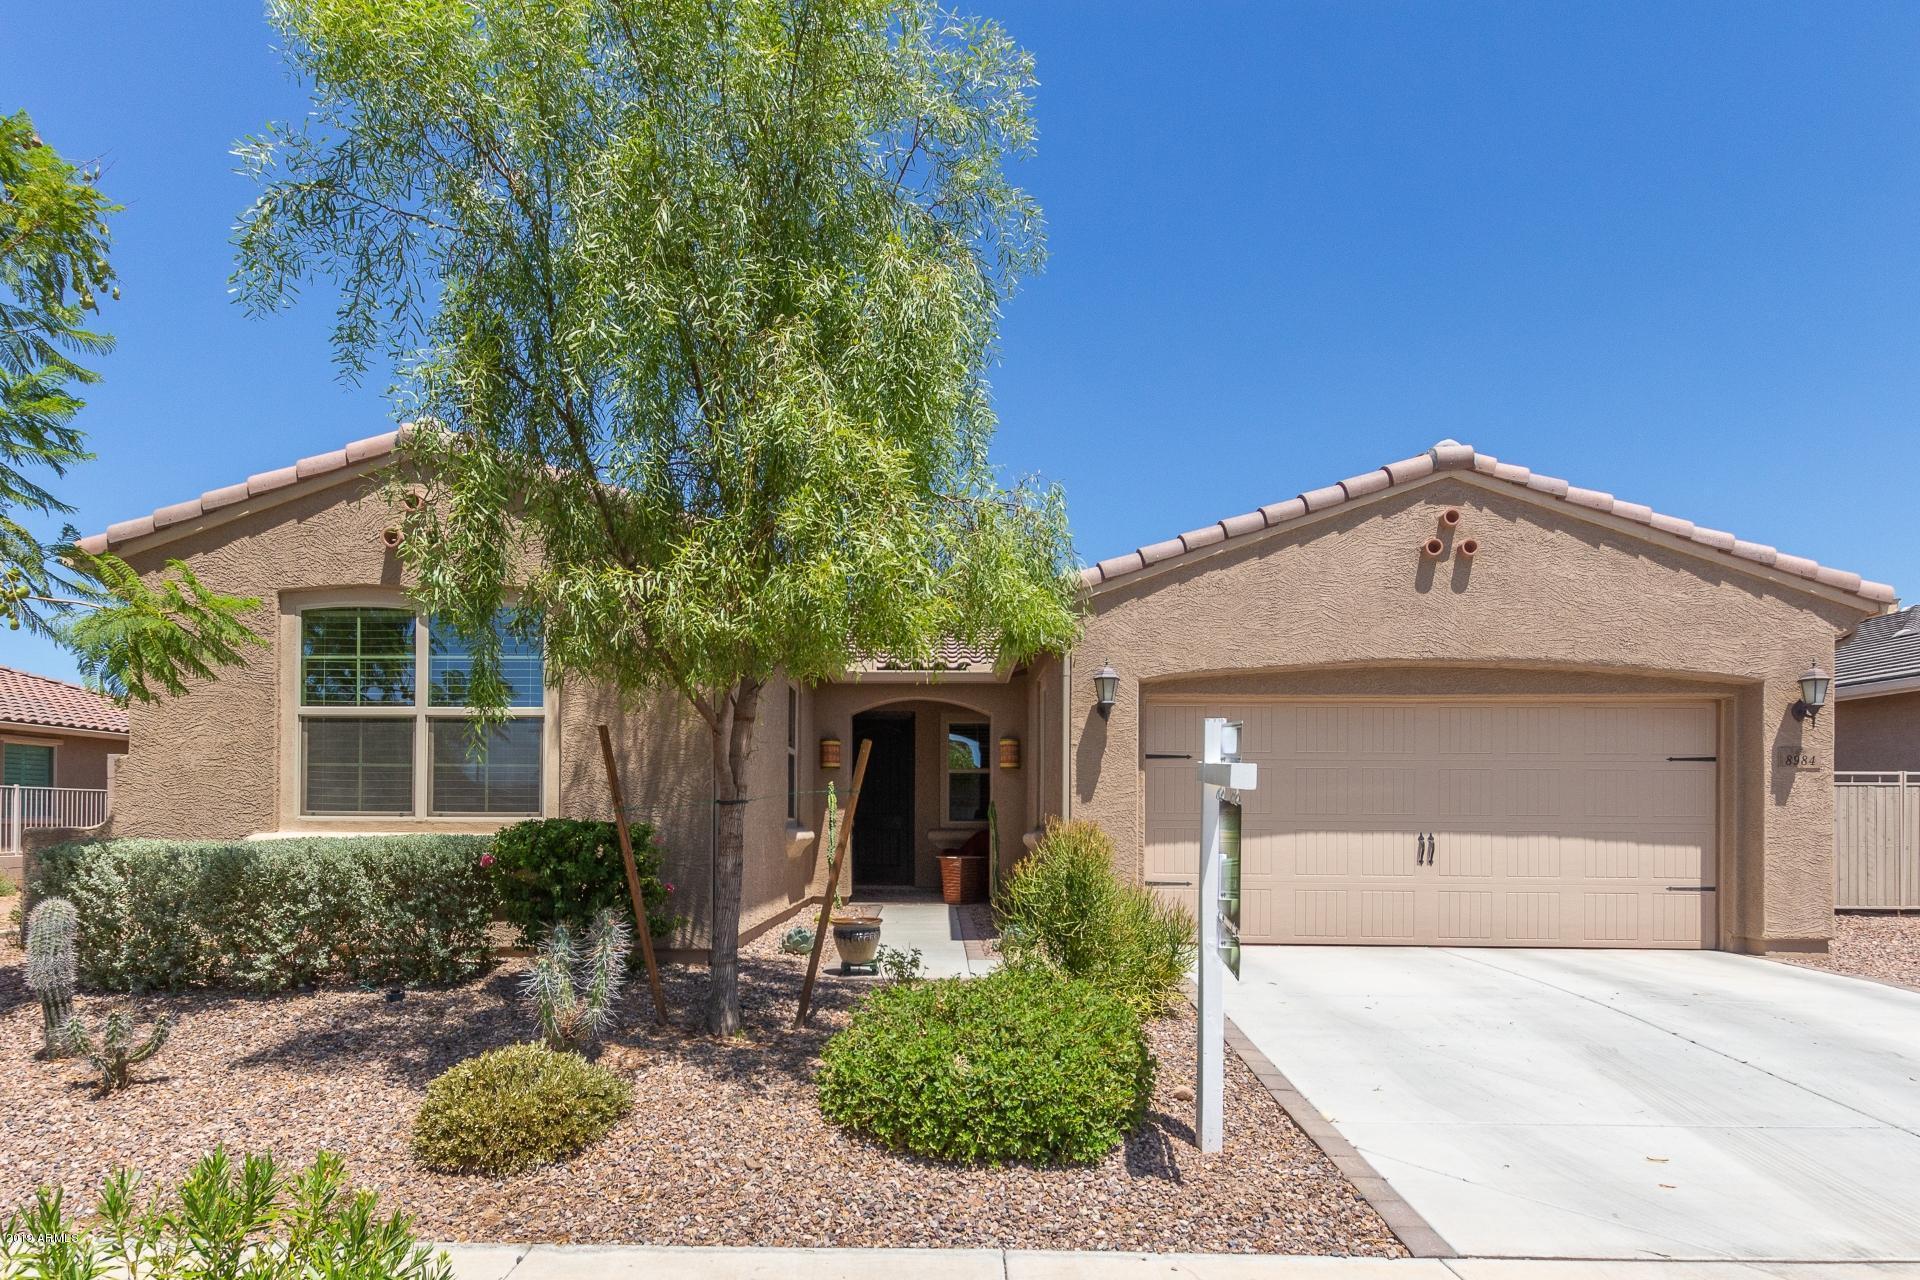 8984 W DIANA Avenue, Peoria, Arizona